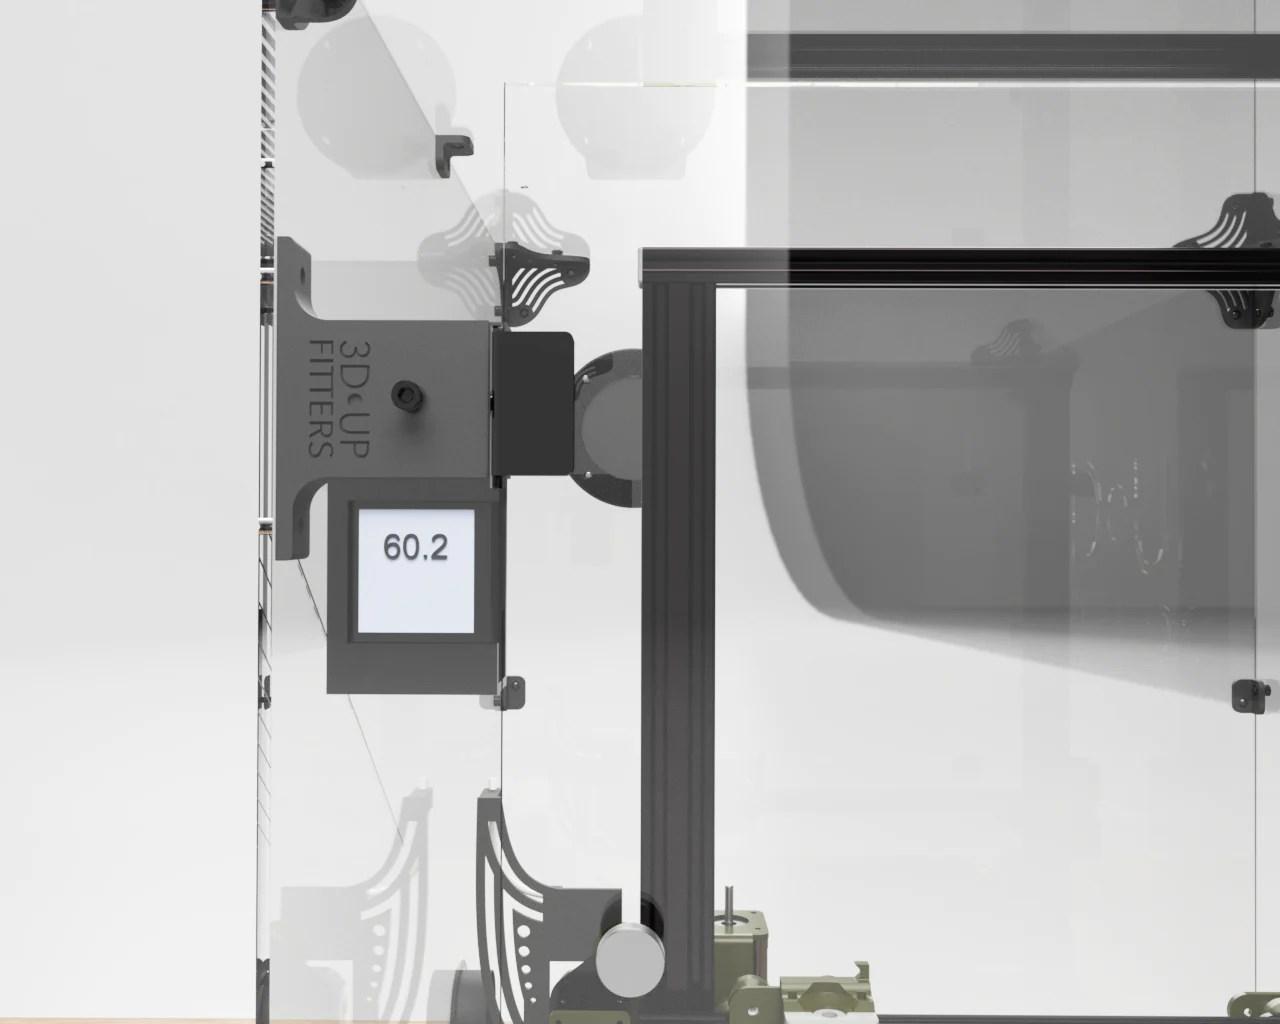 3D Printer Enclosure Kit for Creality CR-10 S4 – 3DUPfitters